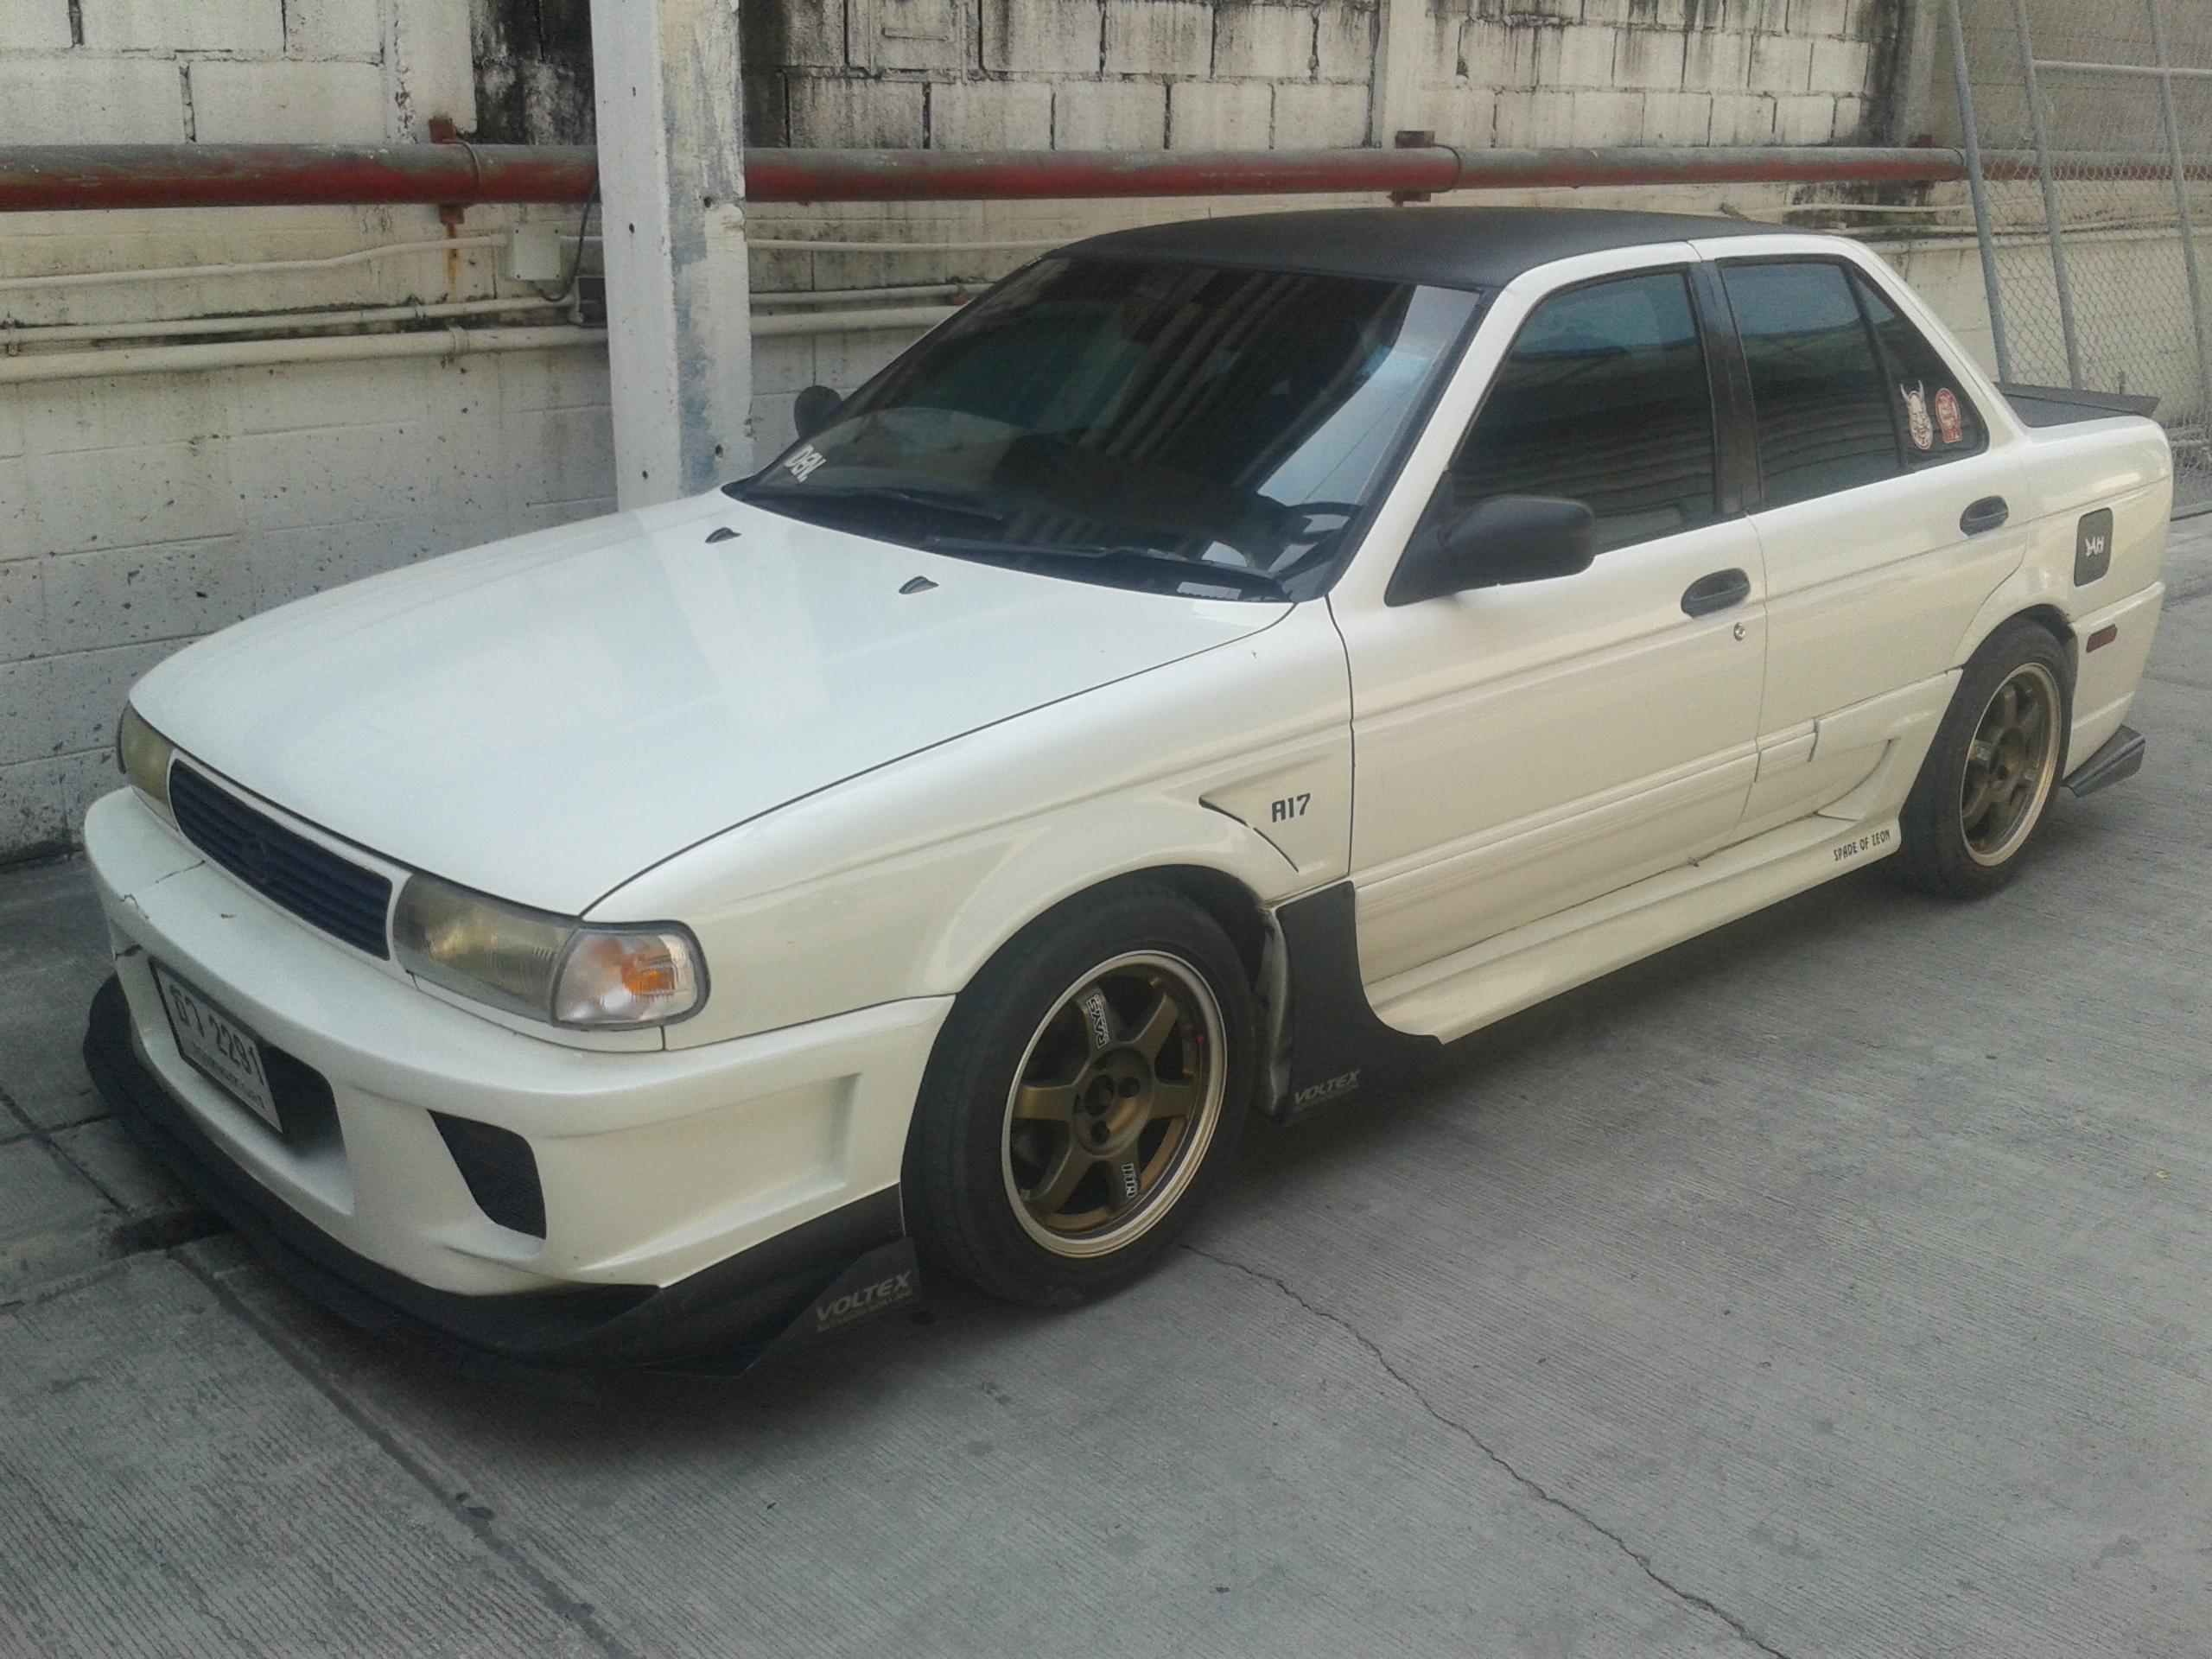 File:Tuned Nissan Sentra (B13) in Thailand 05 jpg